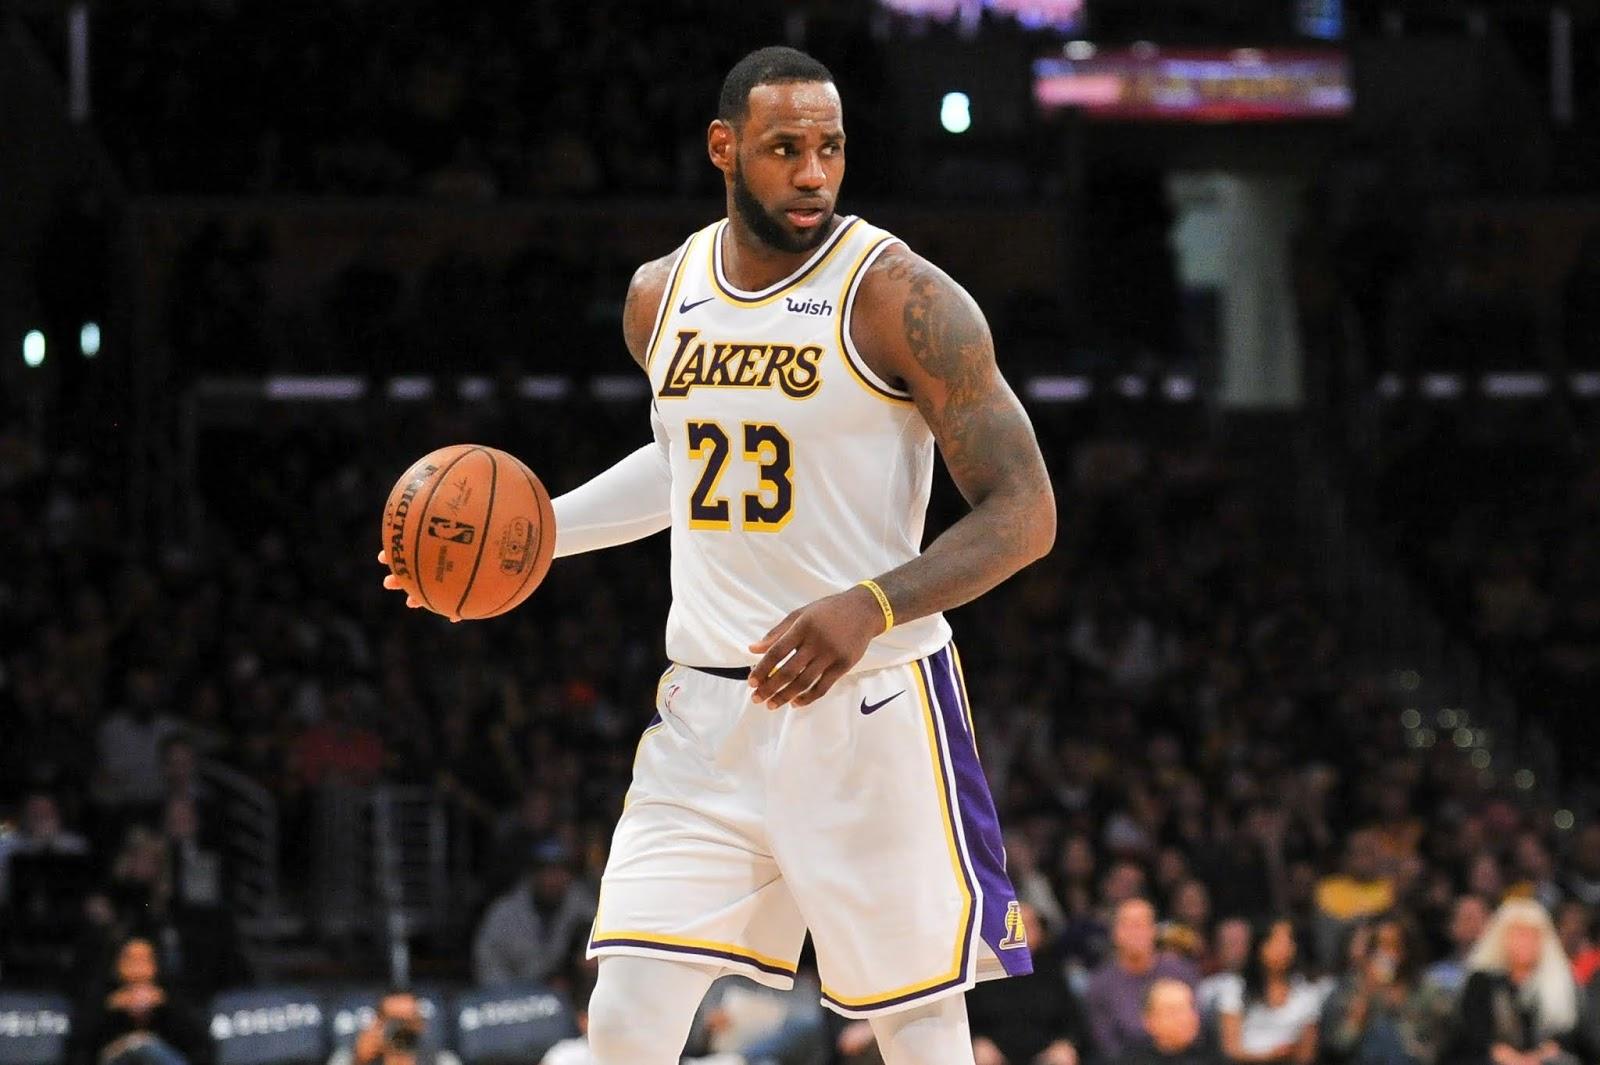 d24b770b85c7 Lakers Shut Down Lebron James For The Rest Of The Season - CLOUDNINE ...